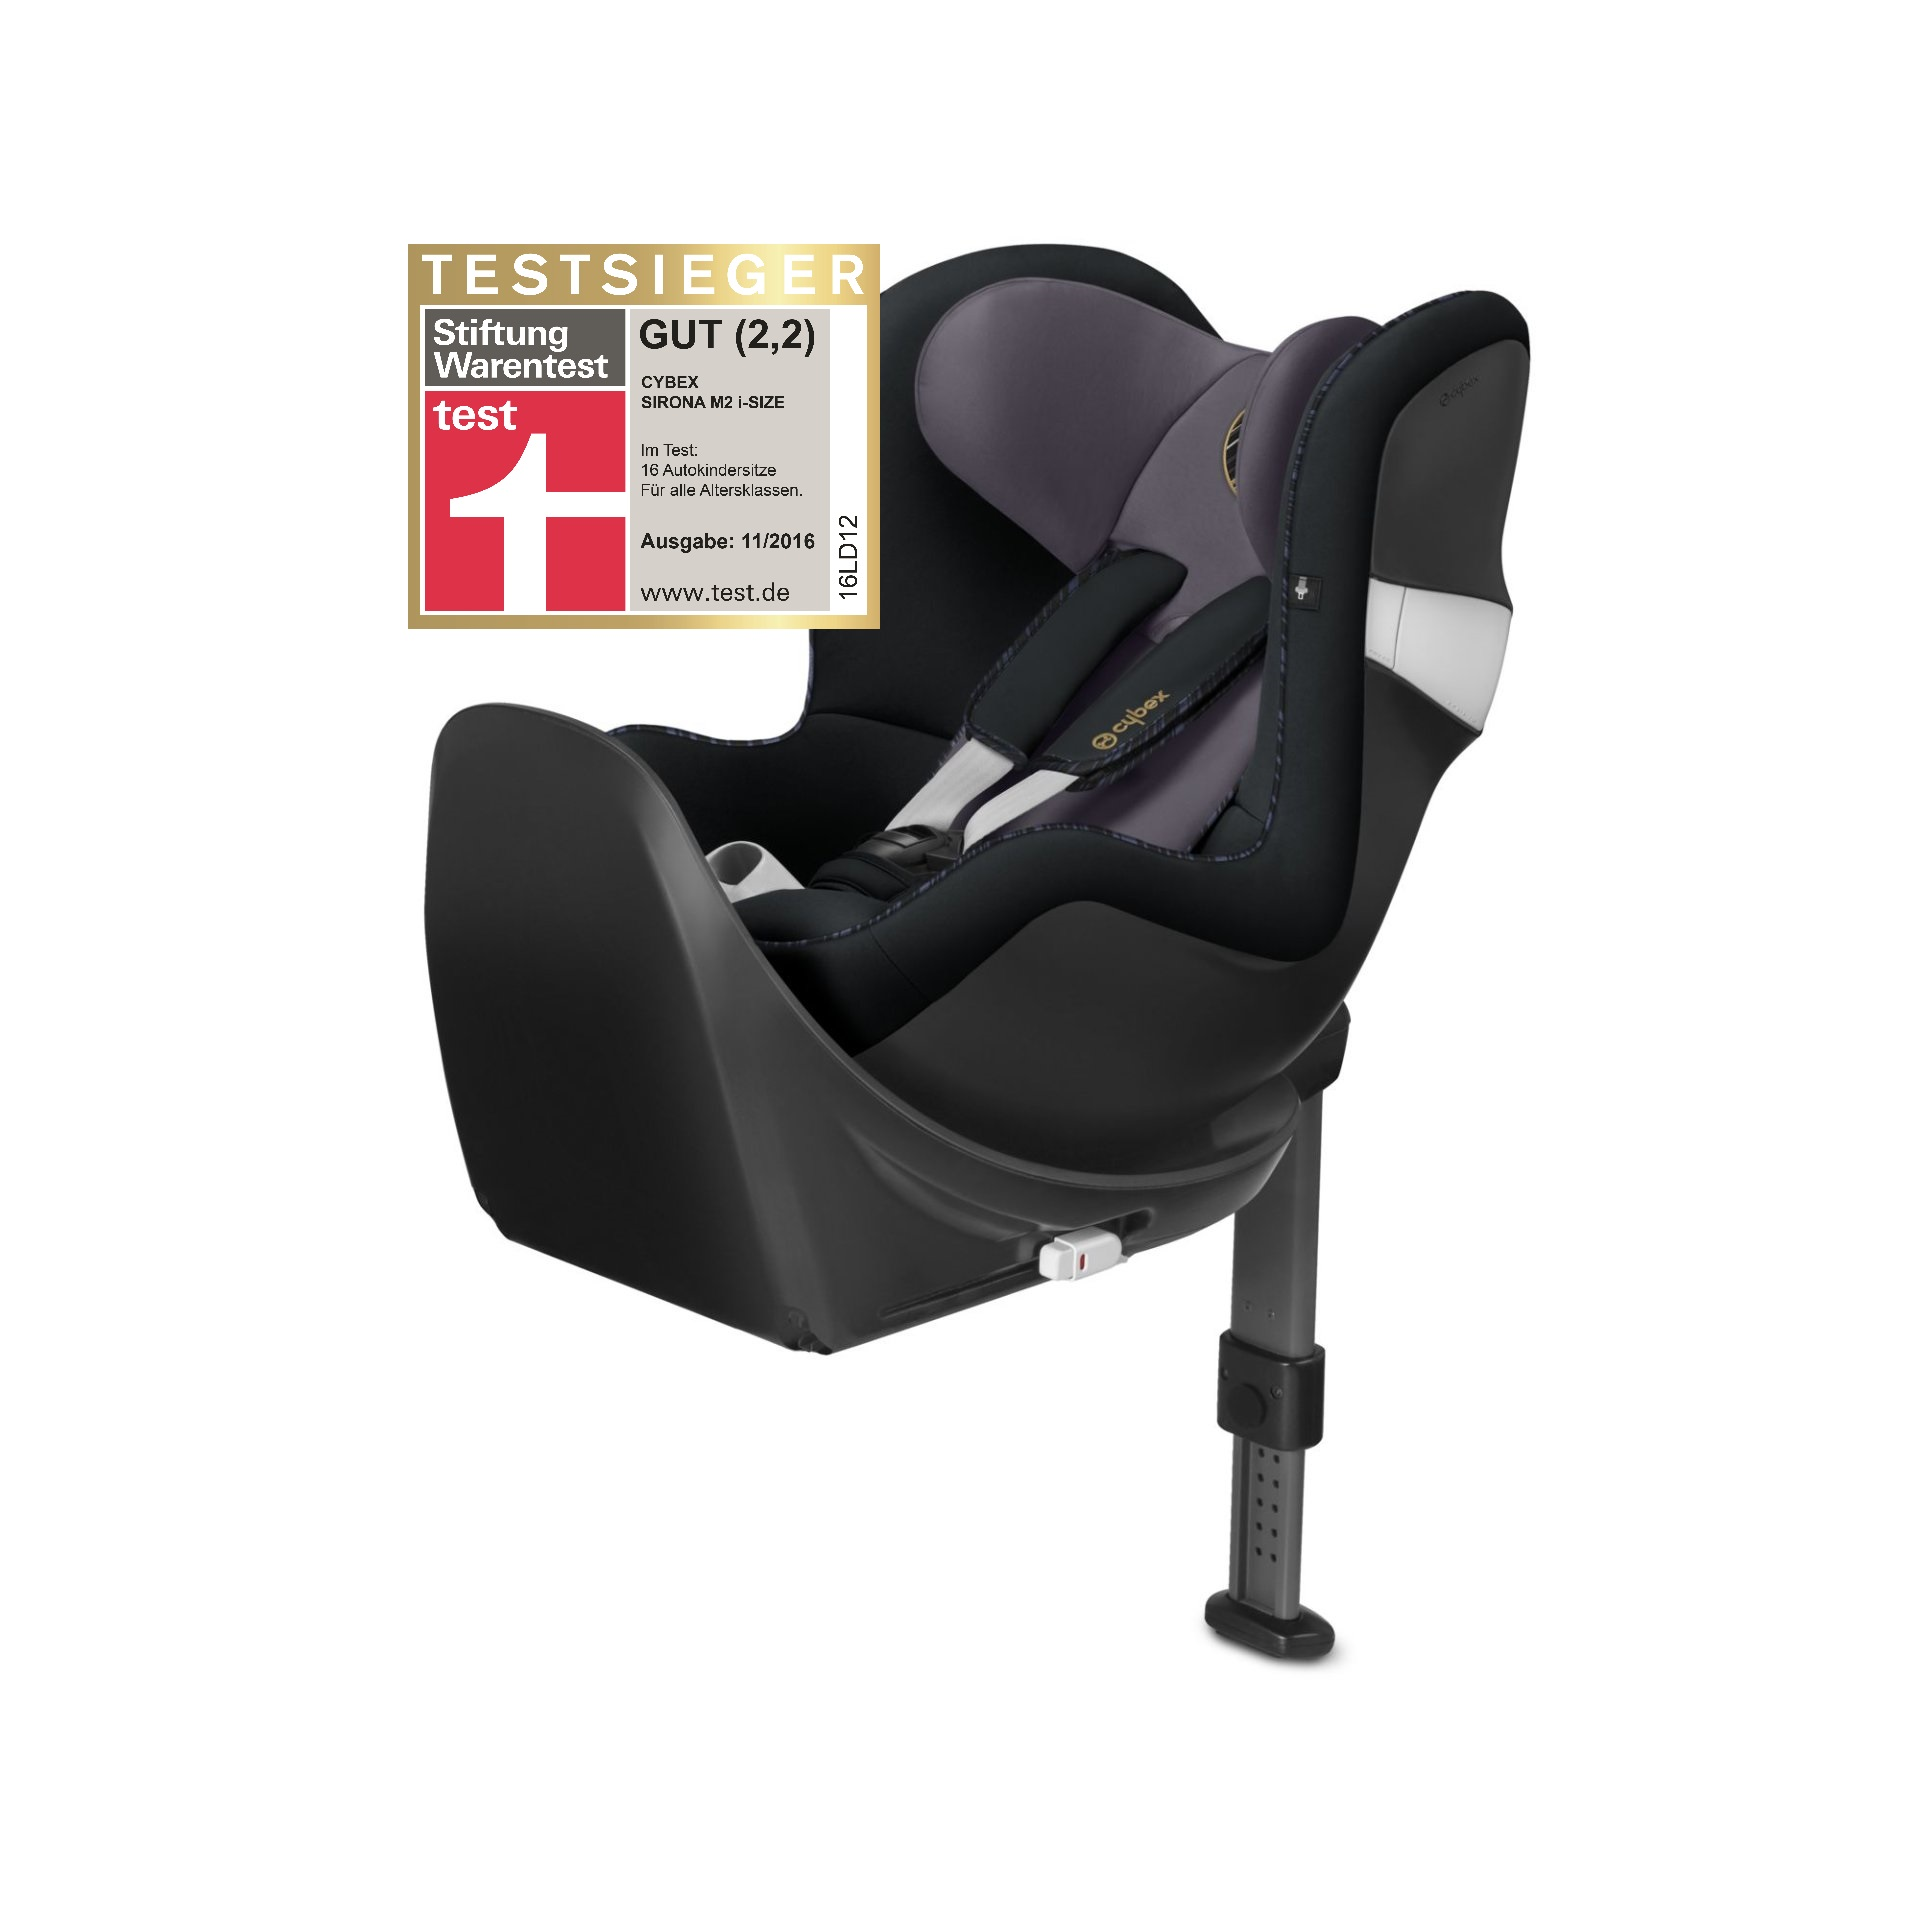 cybex child car seat sirona m2 i size including base m buy at kidsroom car seats. Black Bedroom Furniture Sets. Home Design Ideas